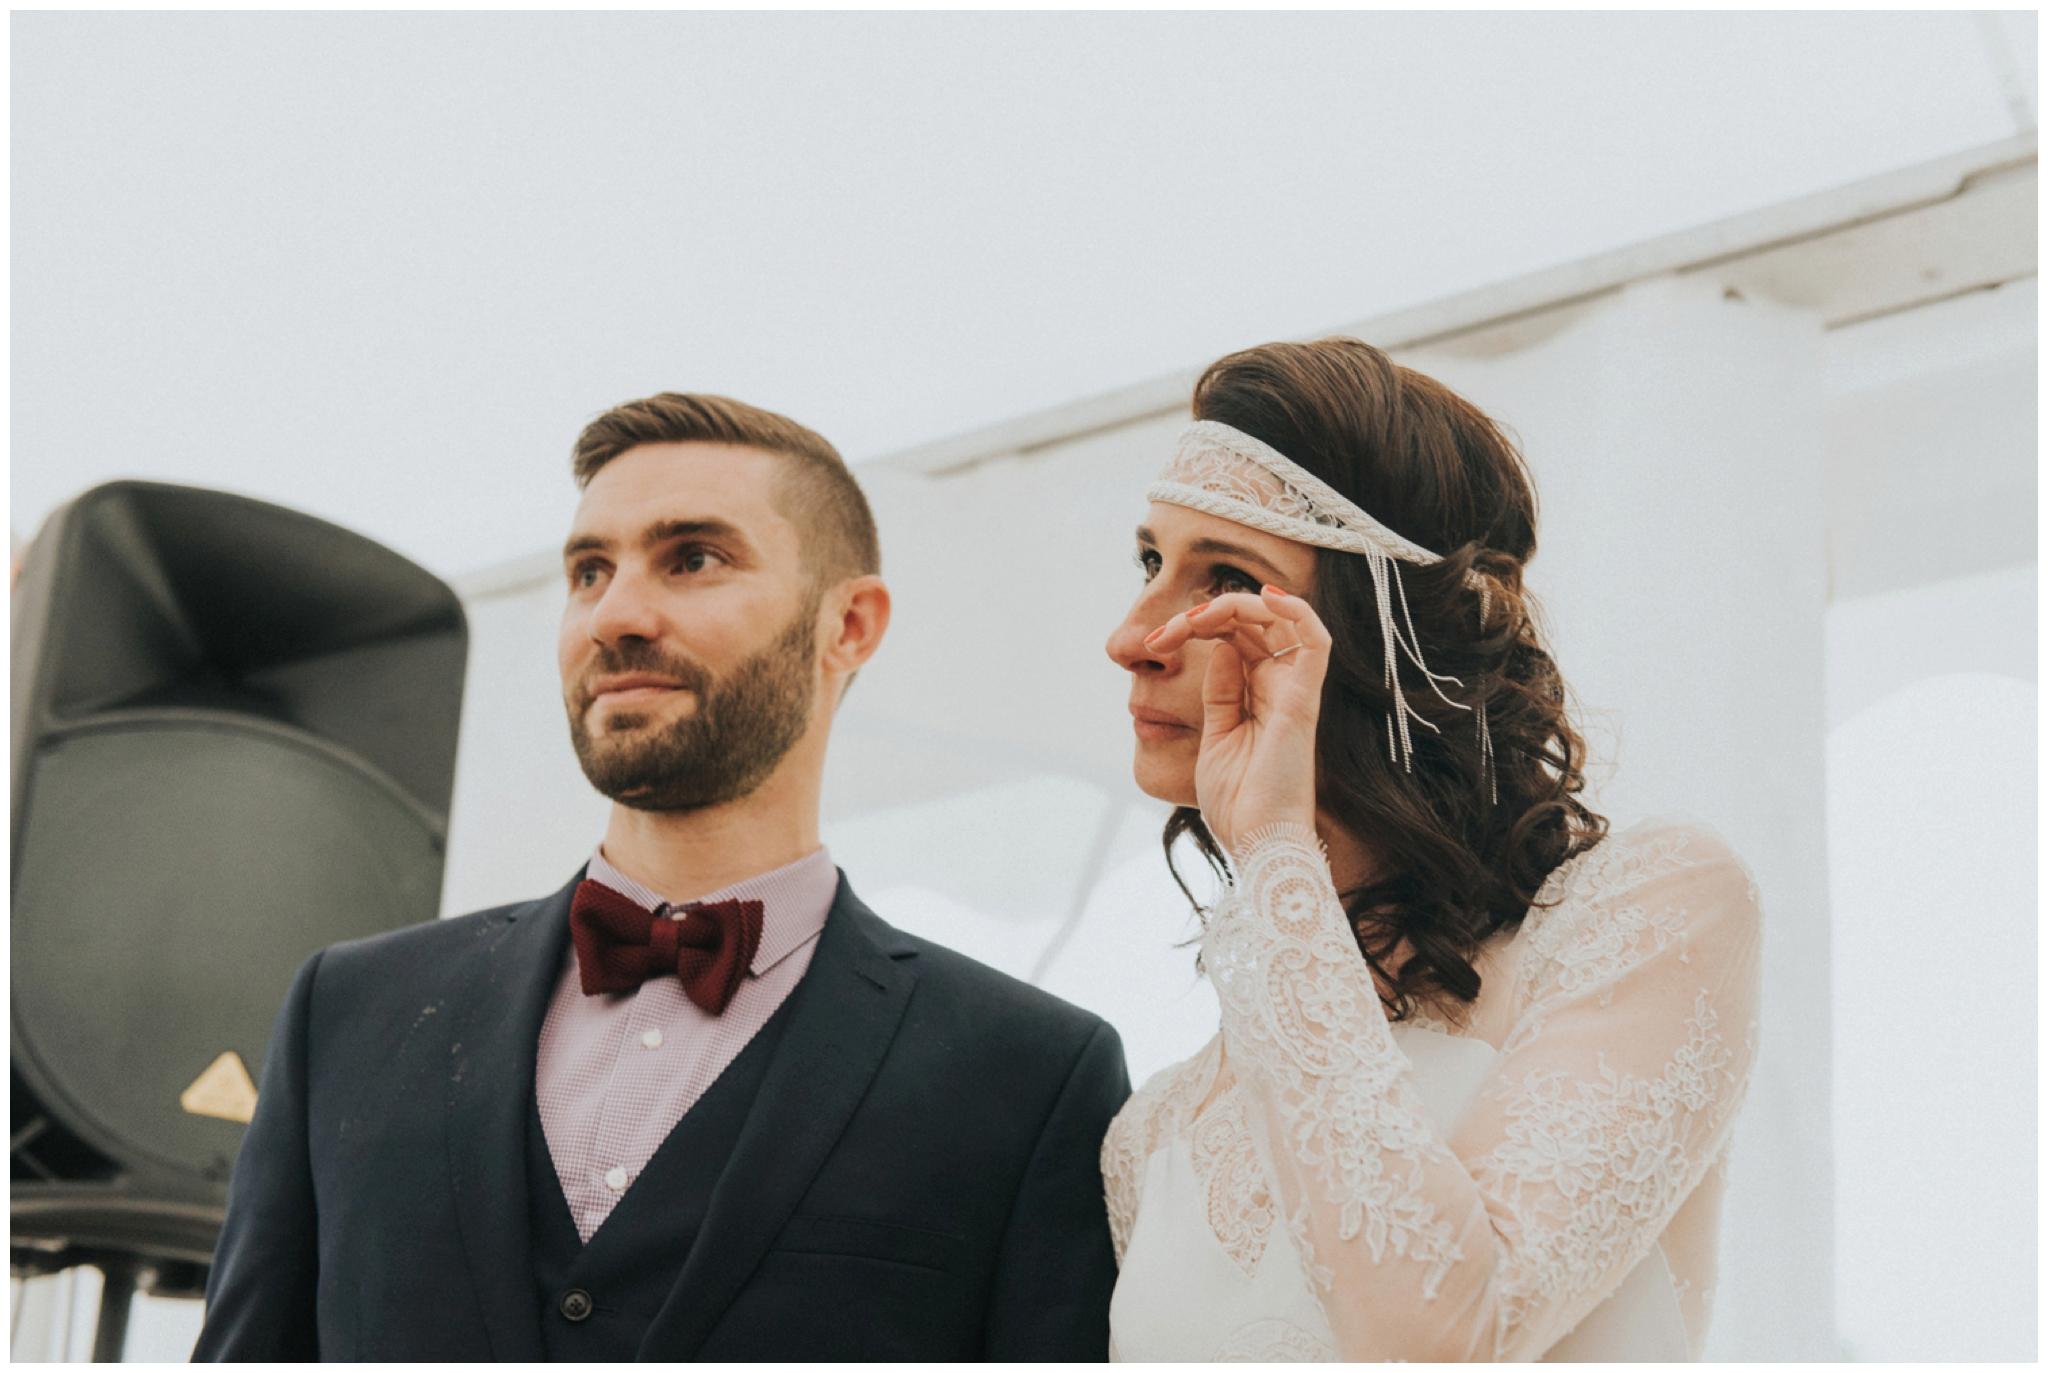 photographe-mariage-montagne-vercors-boho-folk-grenoble-annecy-alpes_0047